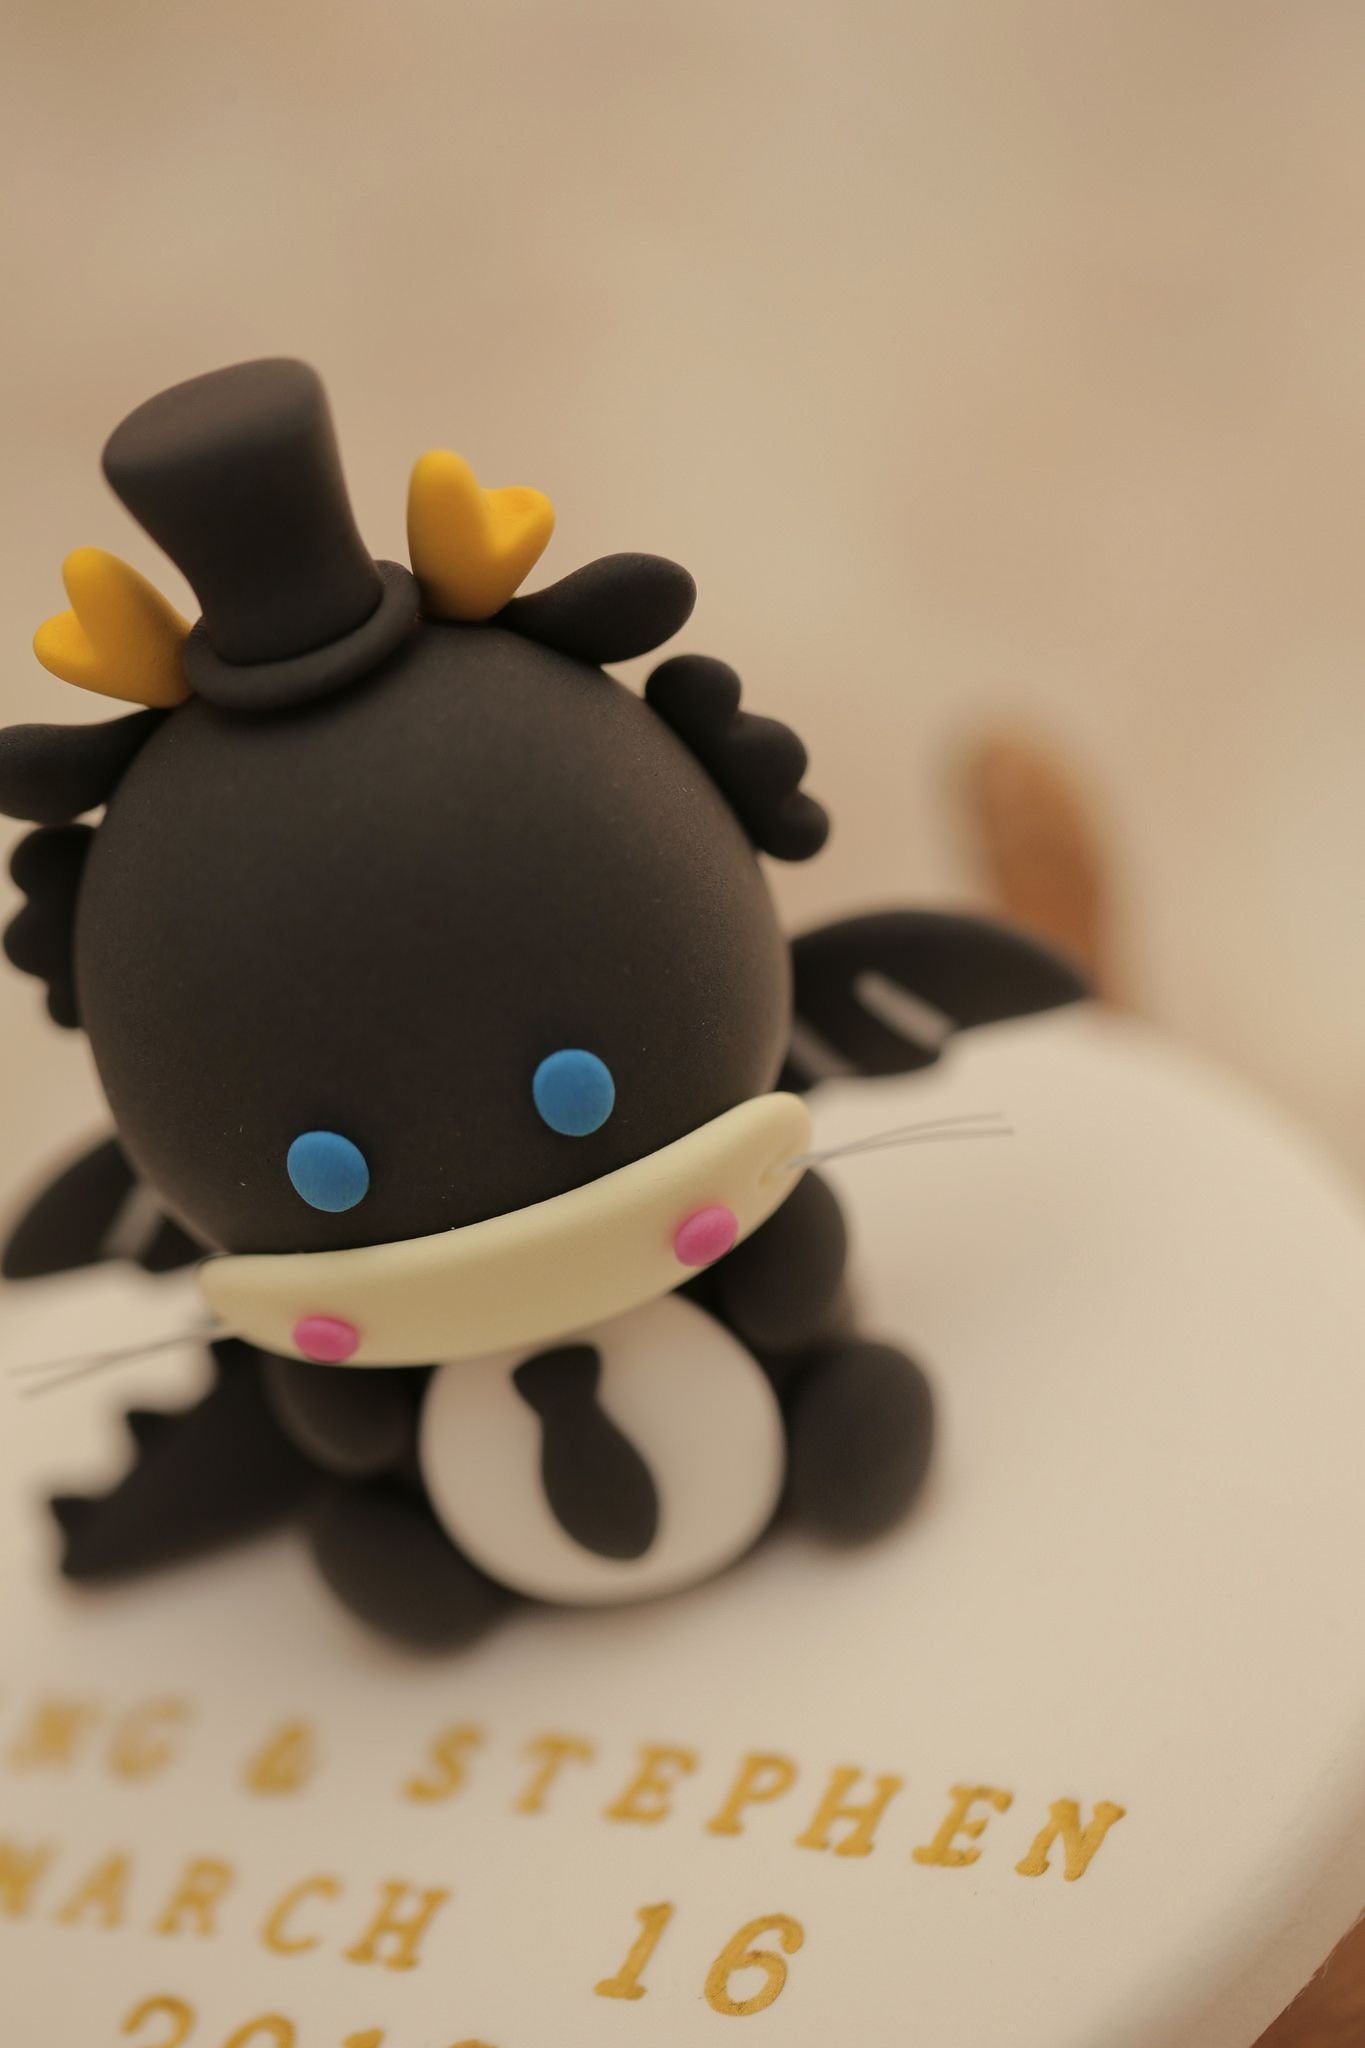 https://flic.kr/p/EumMbj | black dragon wedding cake topper | www.facebook.com/kikuikestudio/